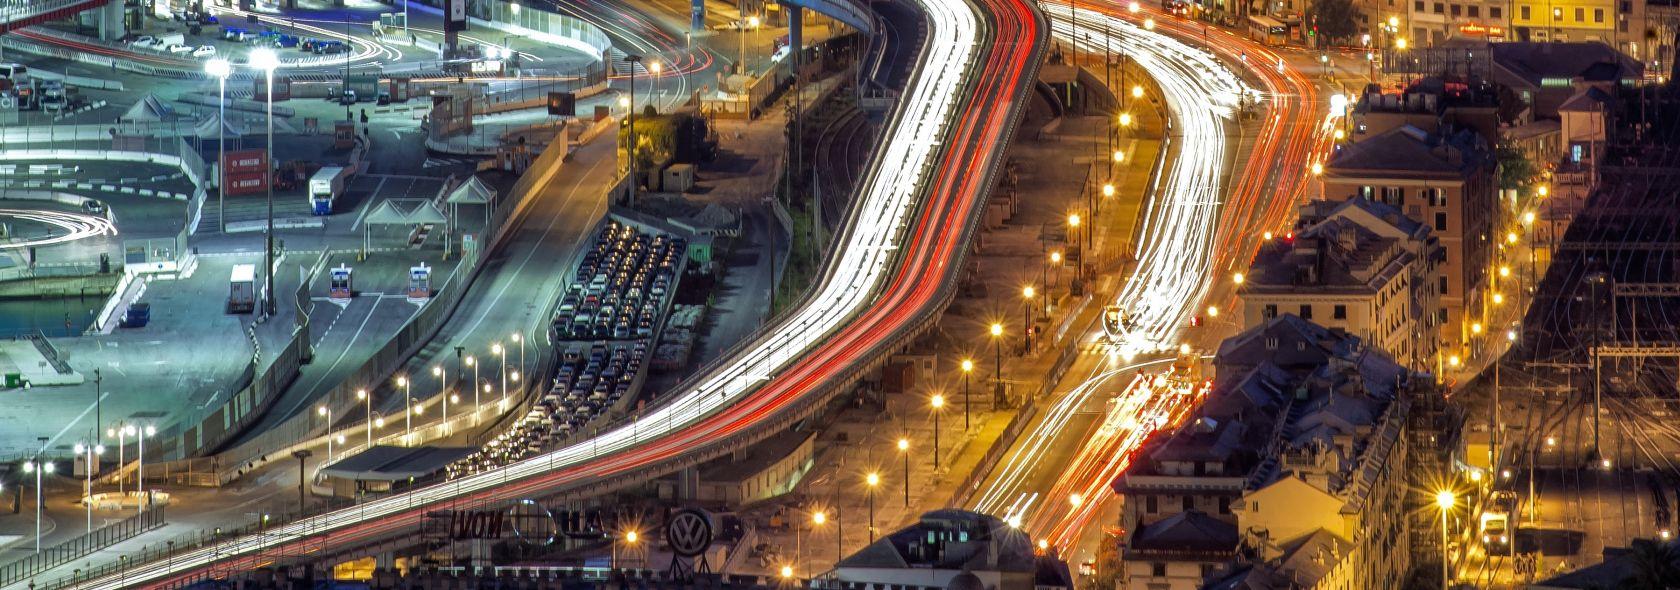 Panorama - foto: Giorgio Luperini